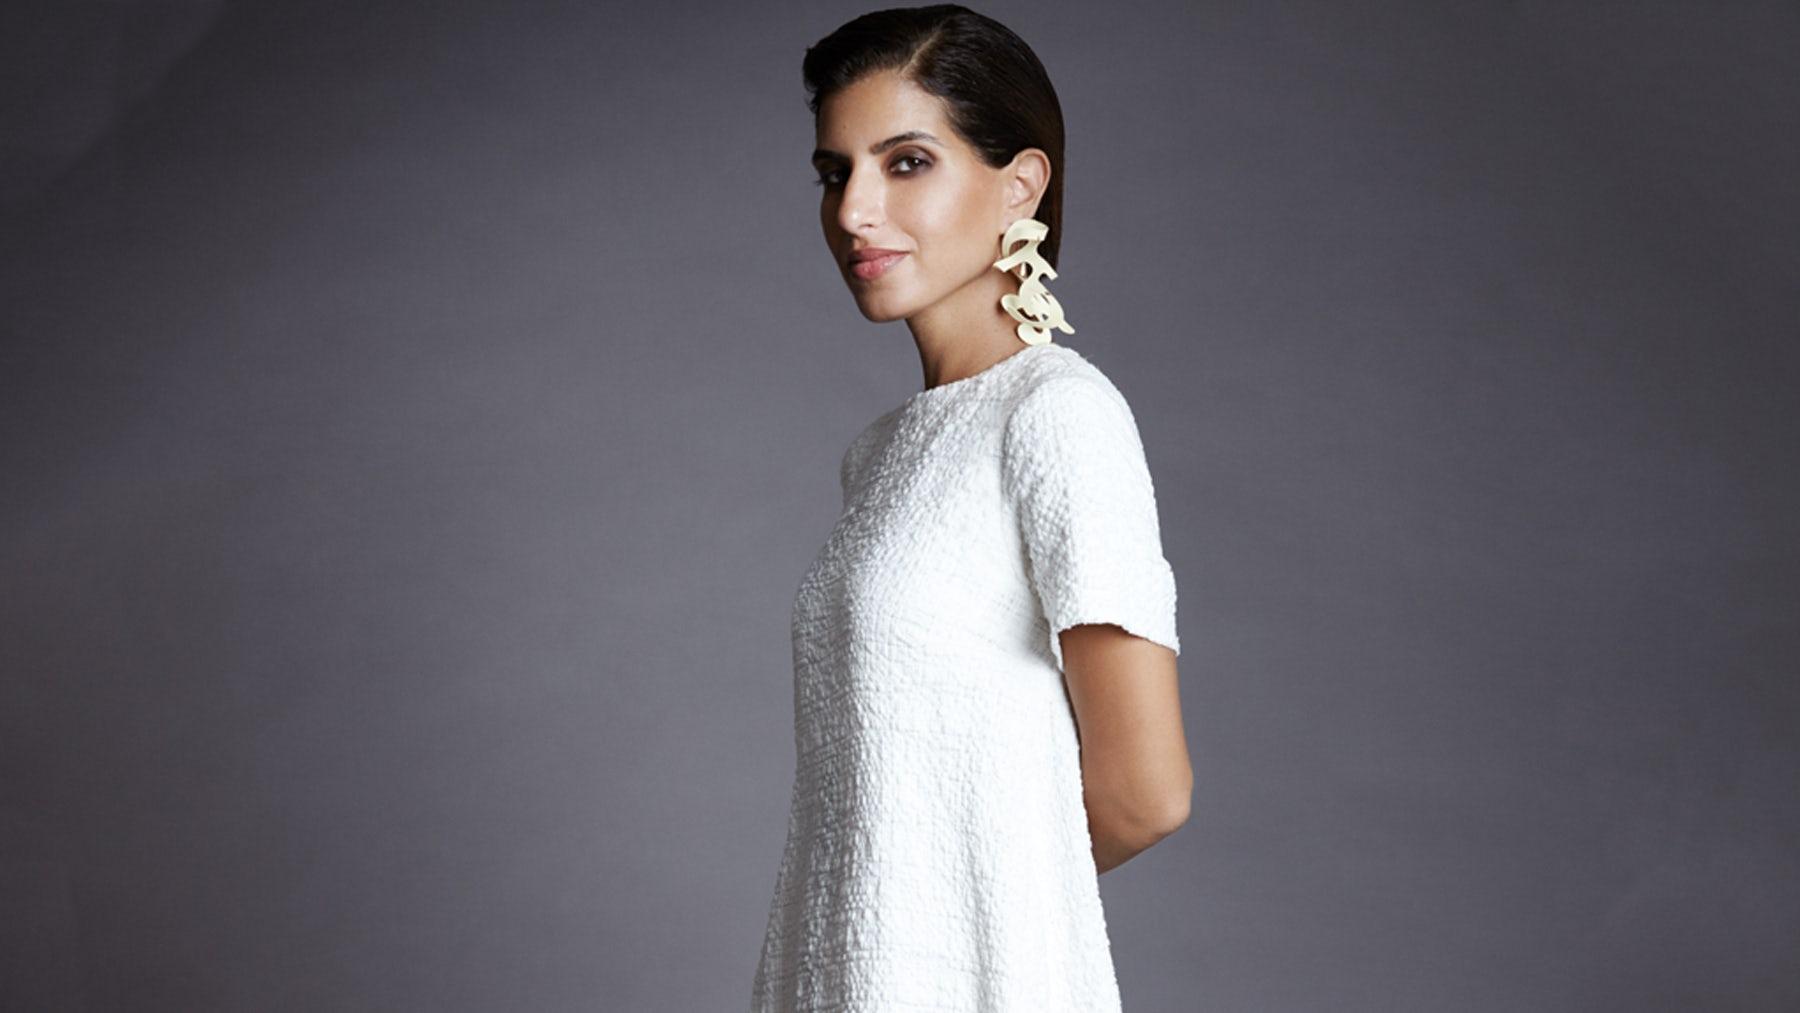 Deena Aljuhani Abdulaziz, editor-in-chief of Vogue Arabia | Source: Courtesy